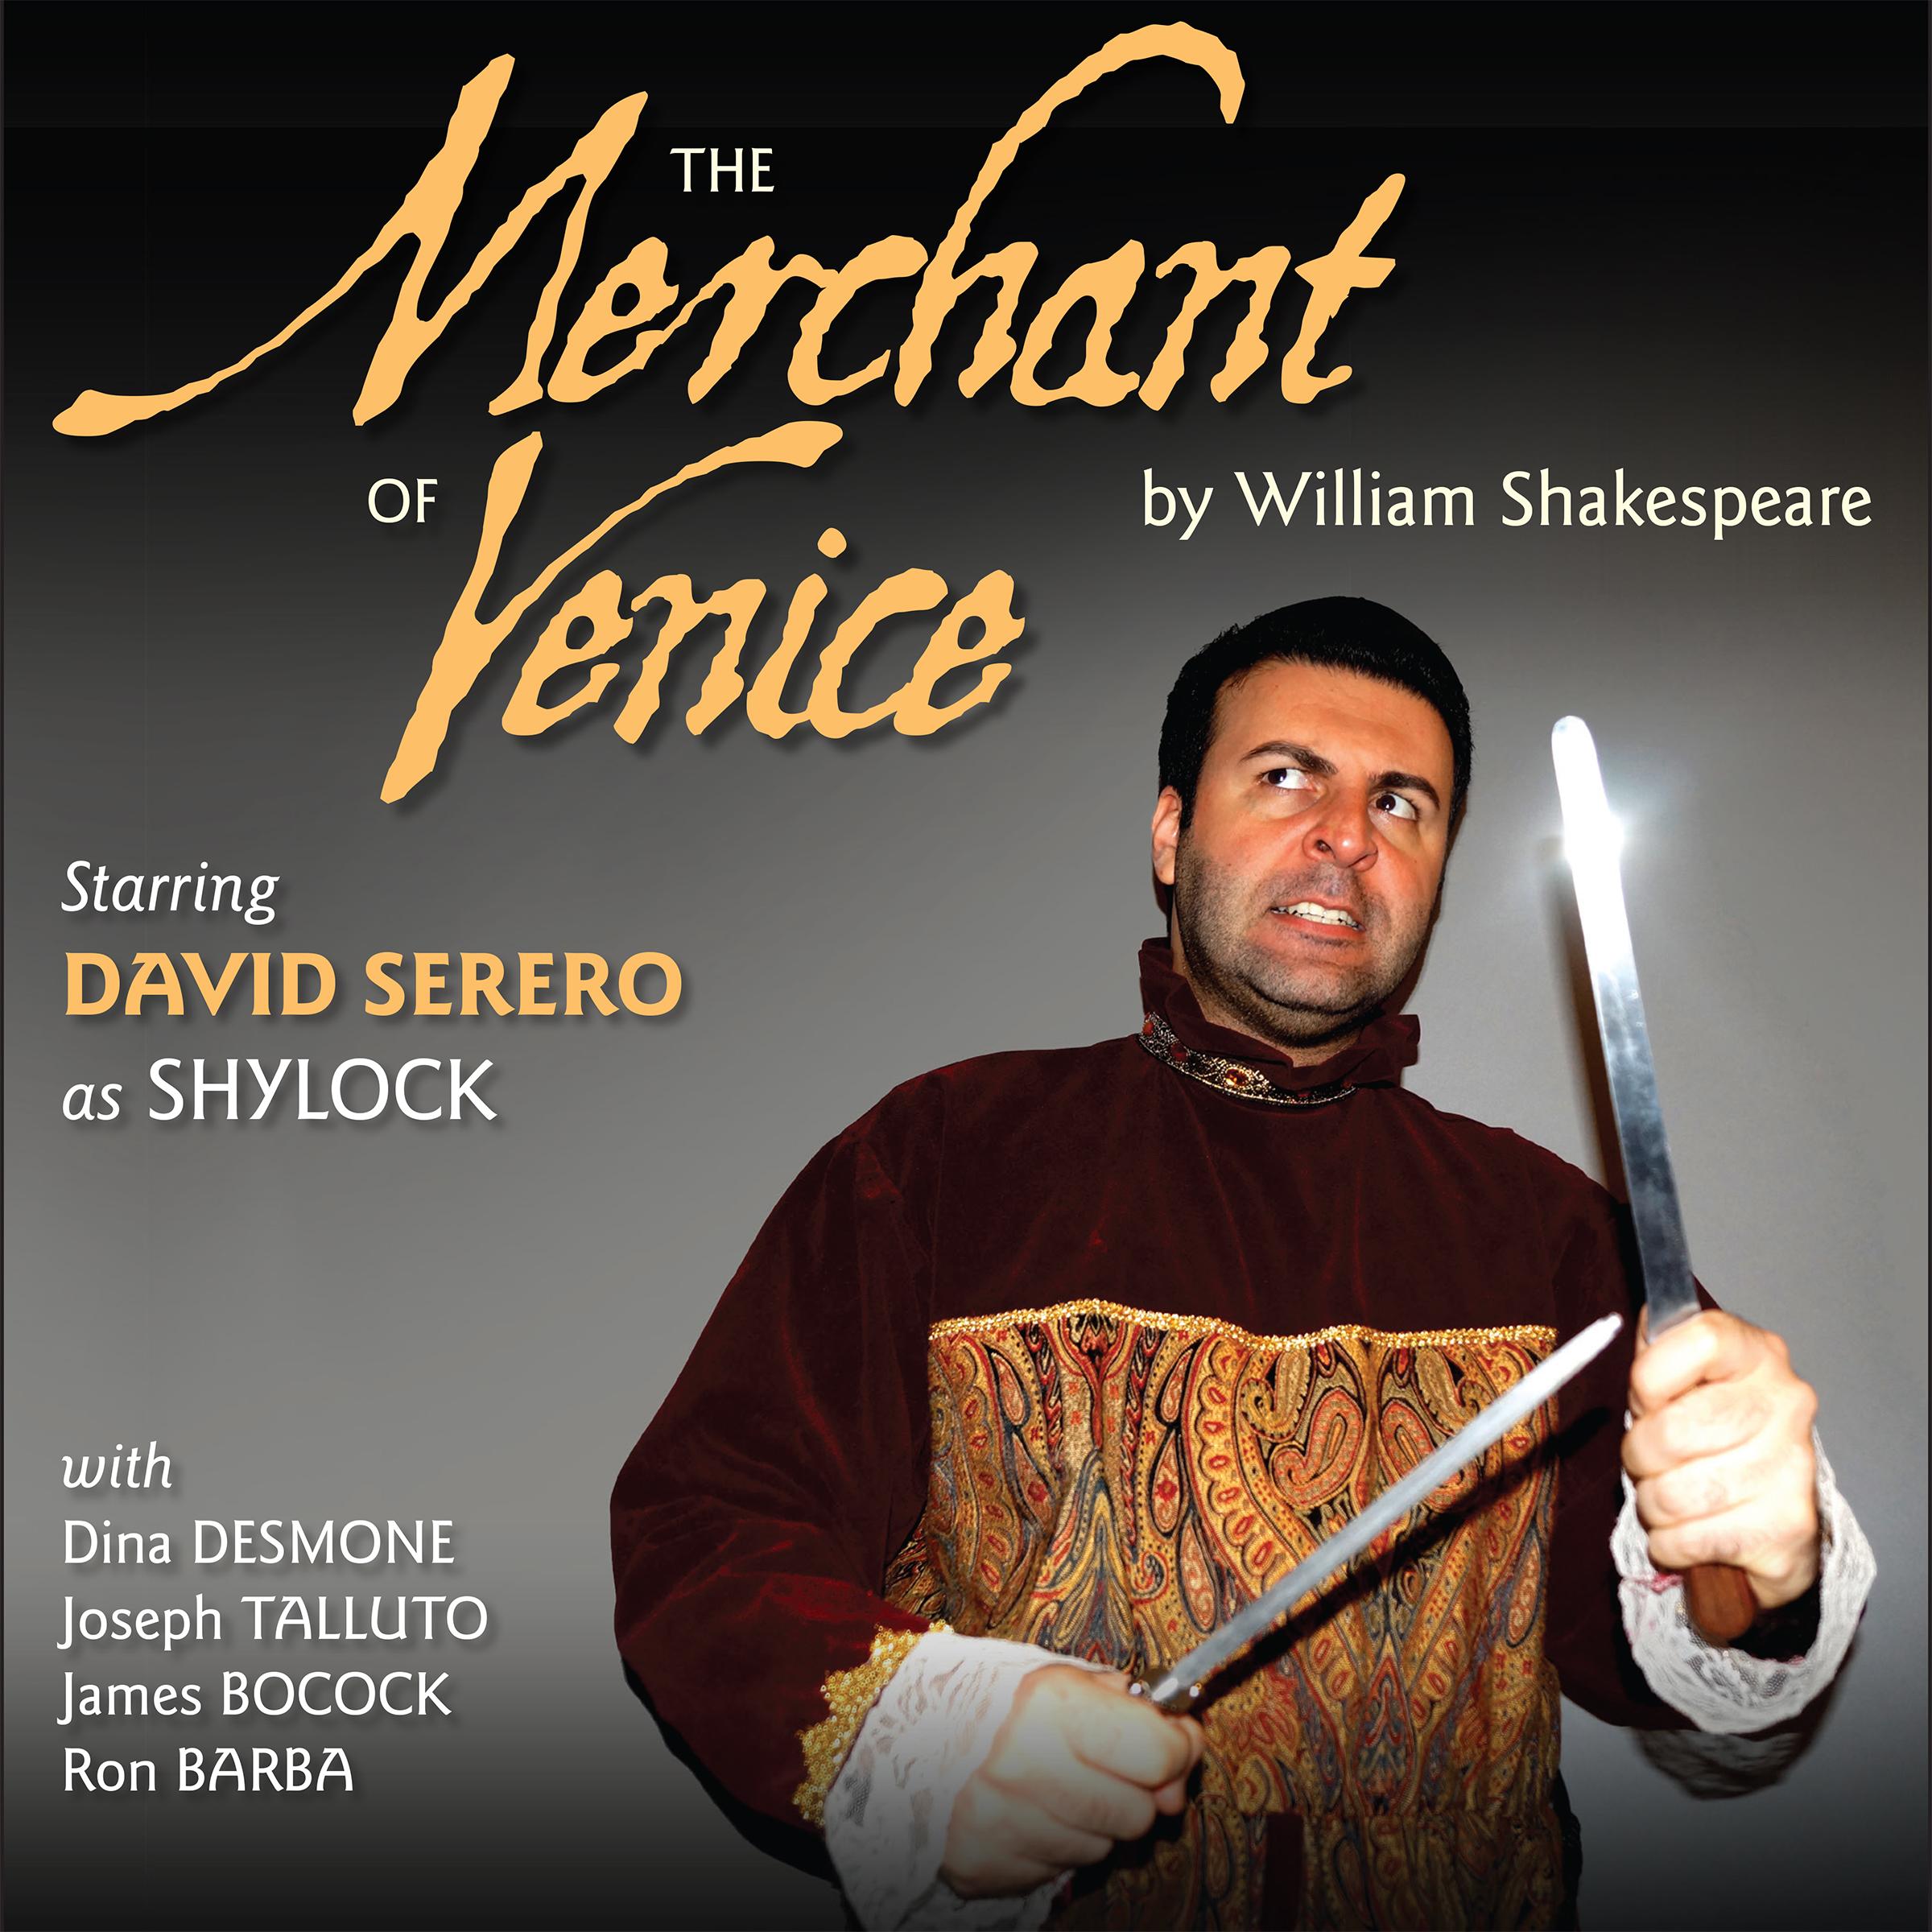 The Merchant of Venice starring David Serero as Shylock audiobook